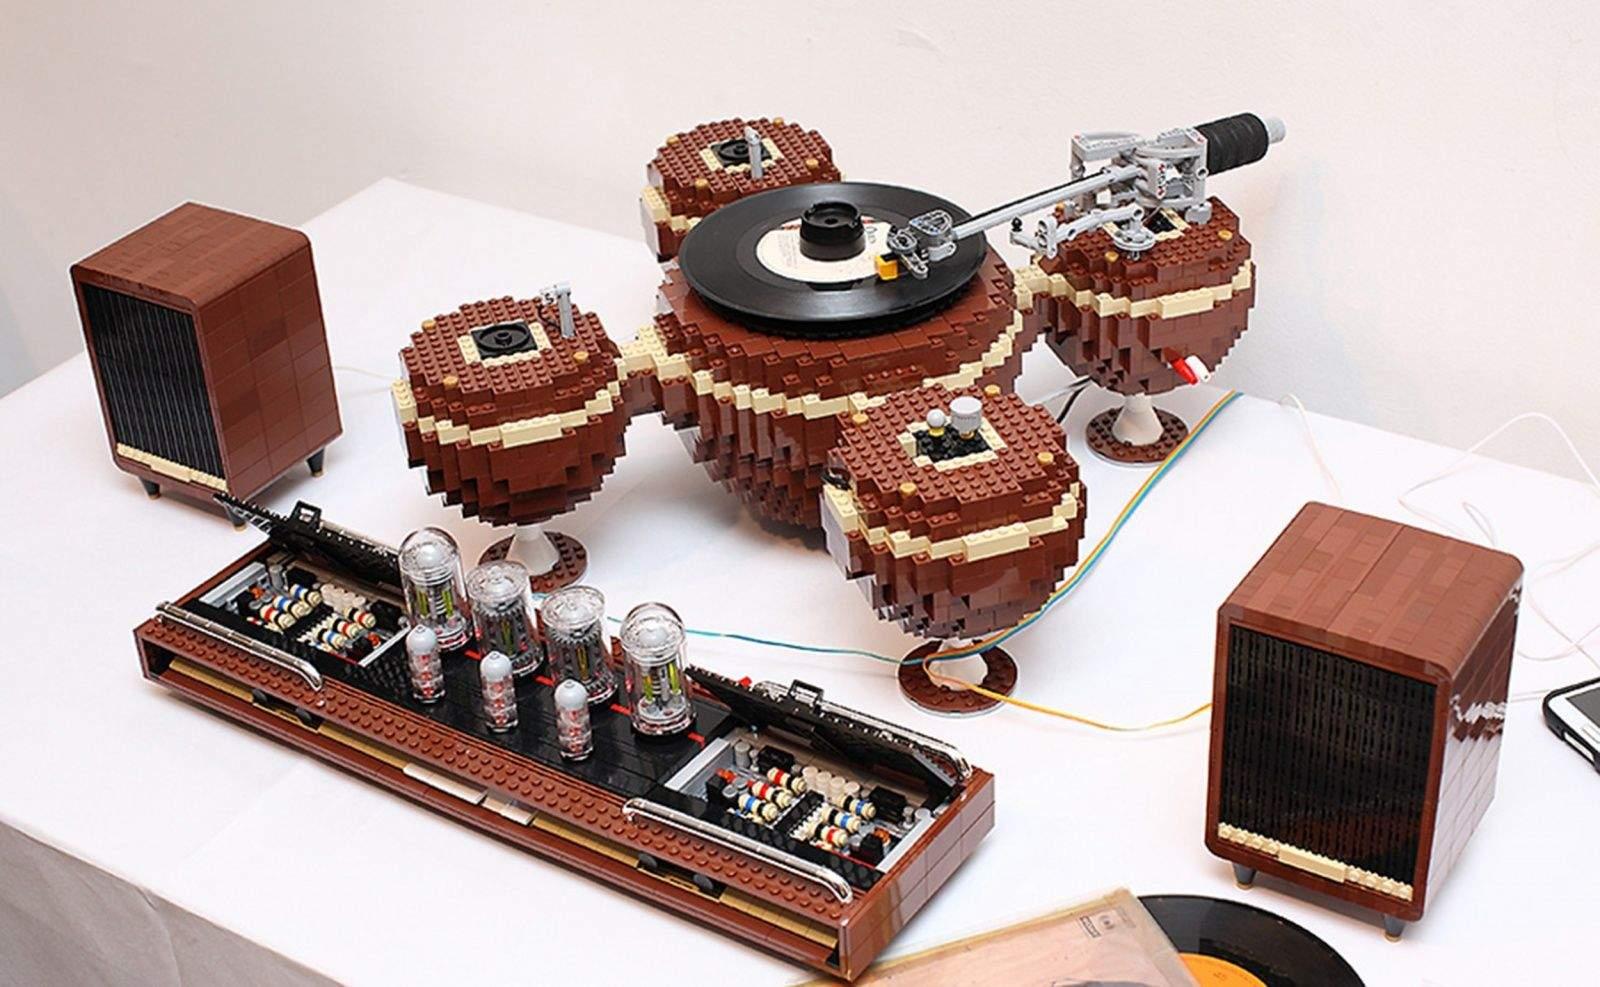 Working turntable, speakers and tube amp by LEGO artist Hayarobi. Photo: LoctiteGirl/Flickr CC